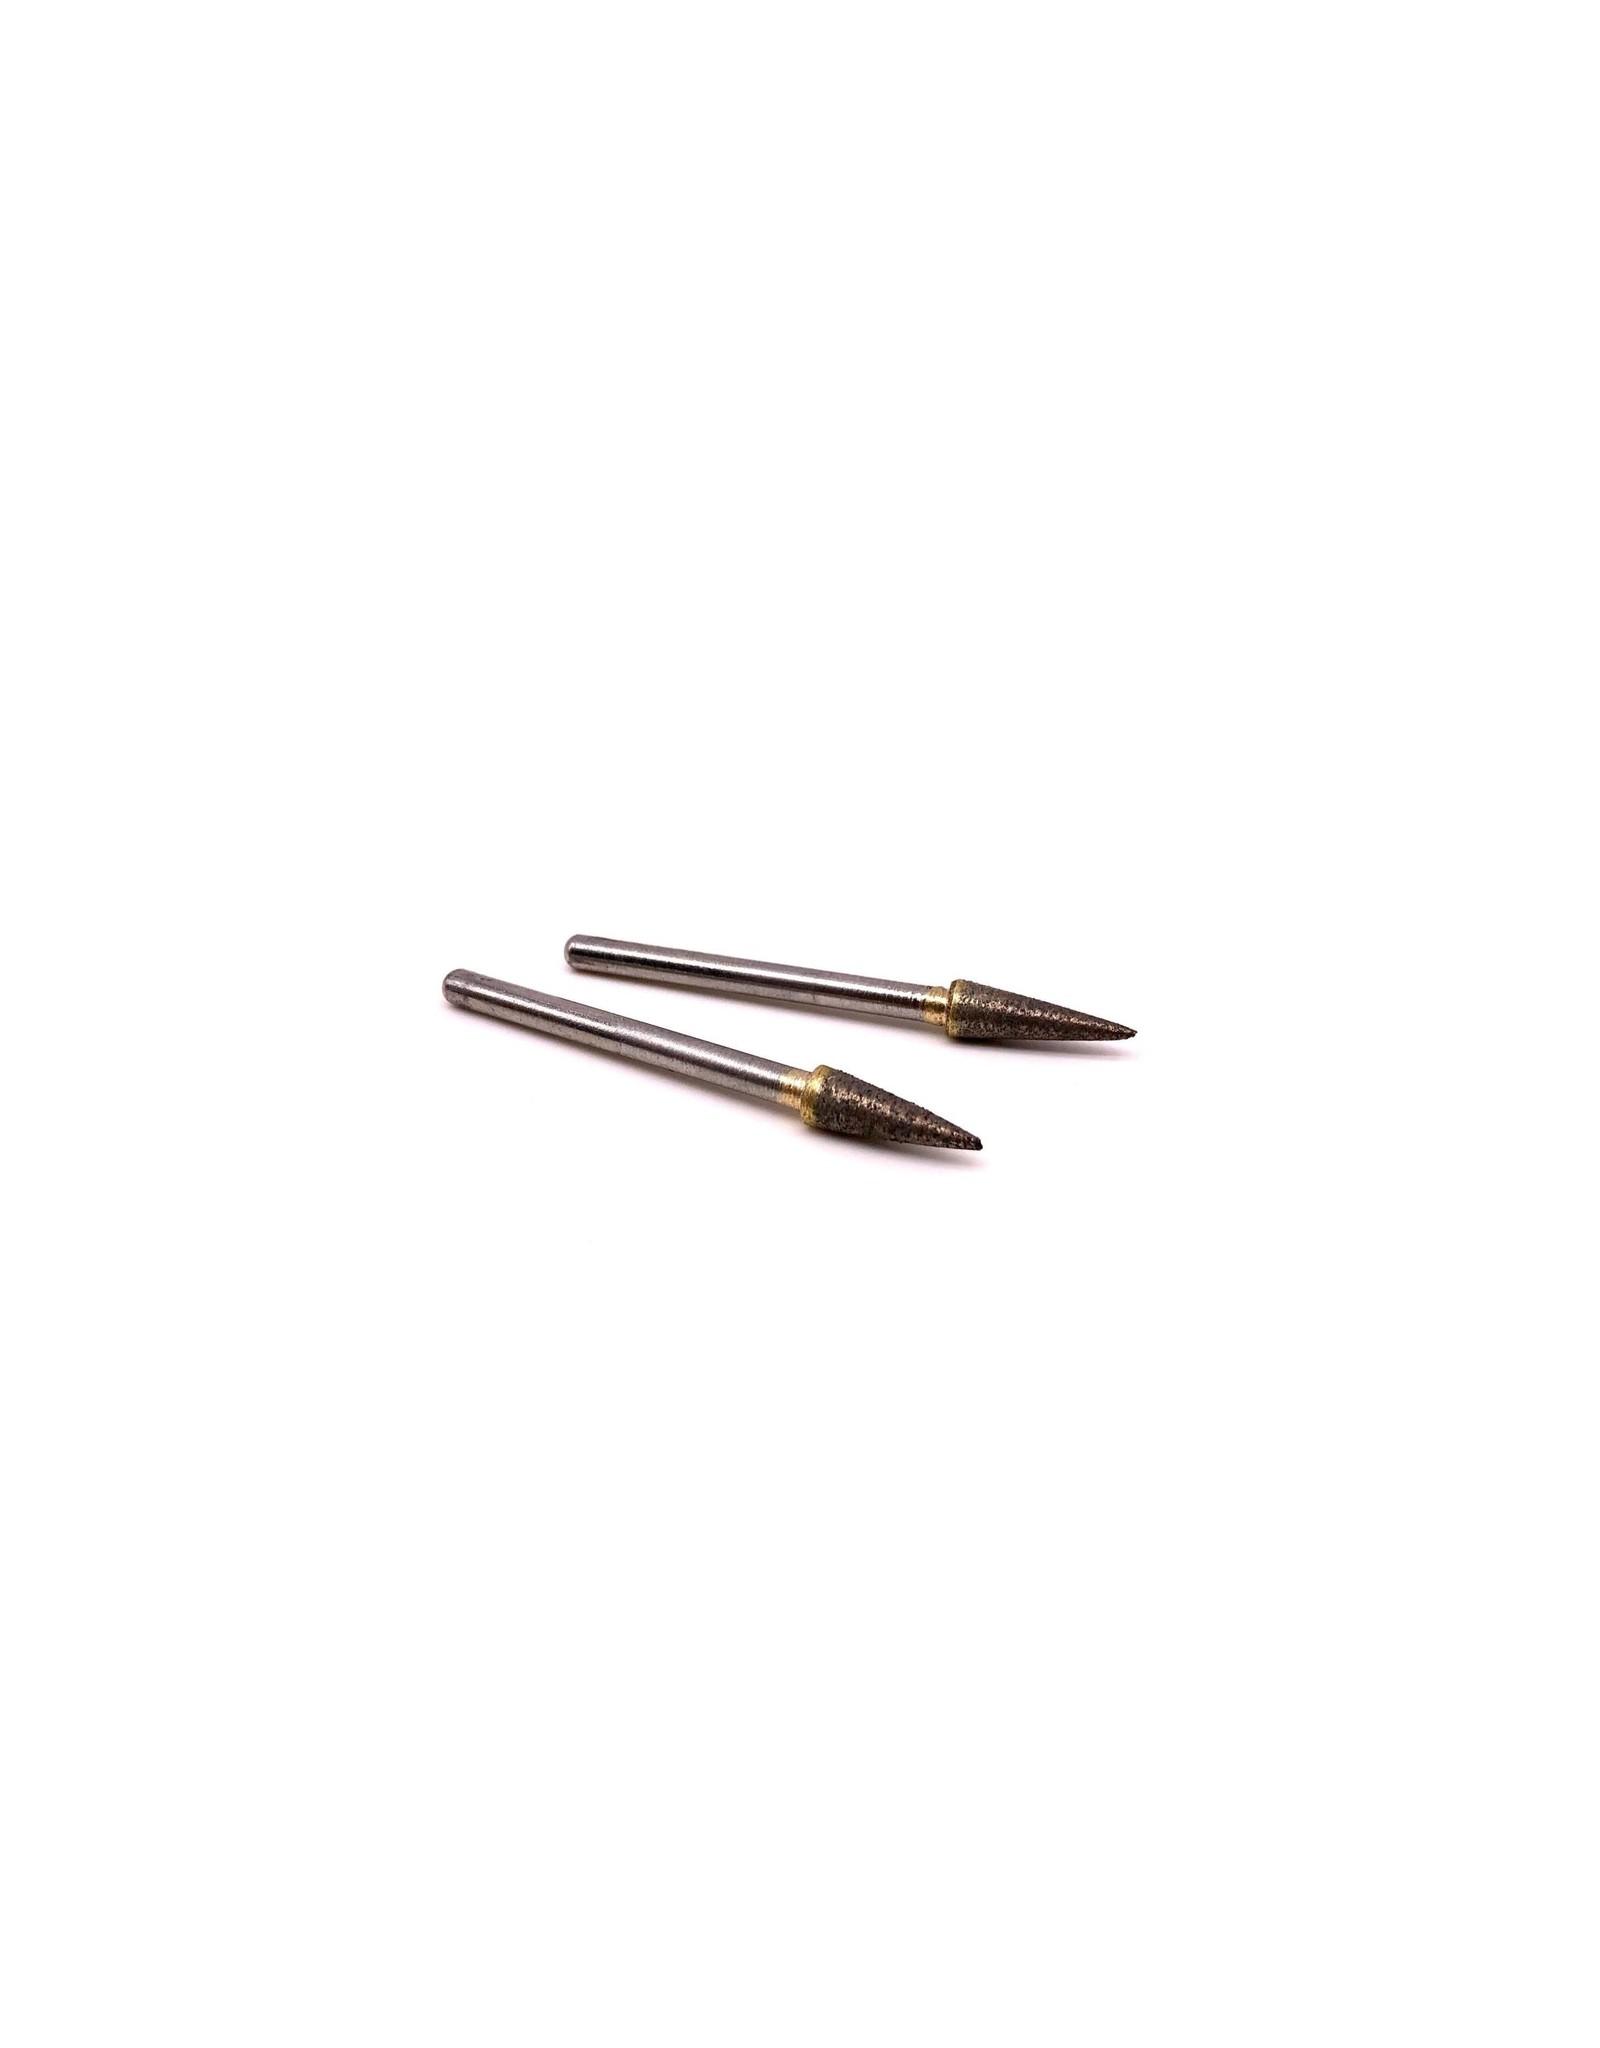 Diamond Core Tools Rotary tool - Slim cone (D11) 80 Grit